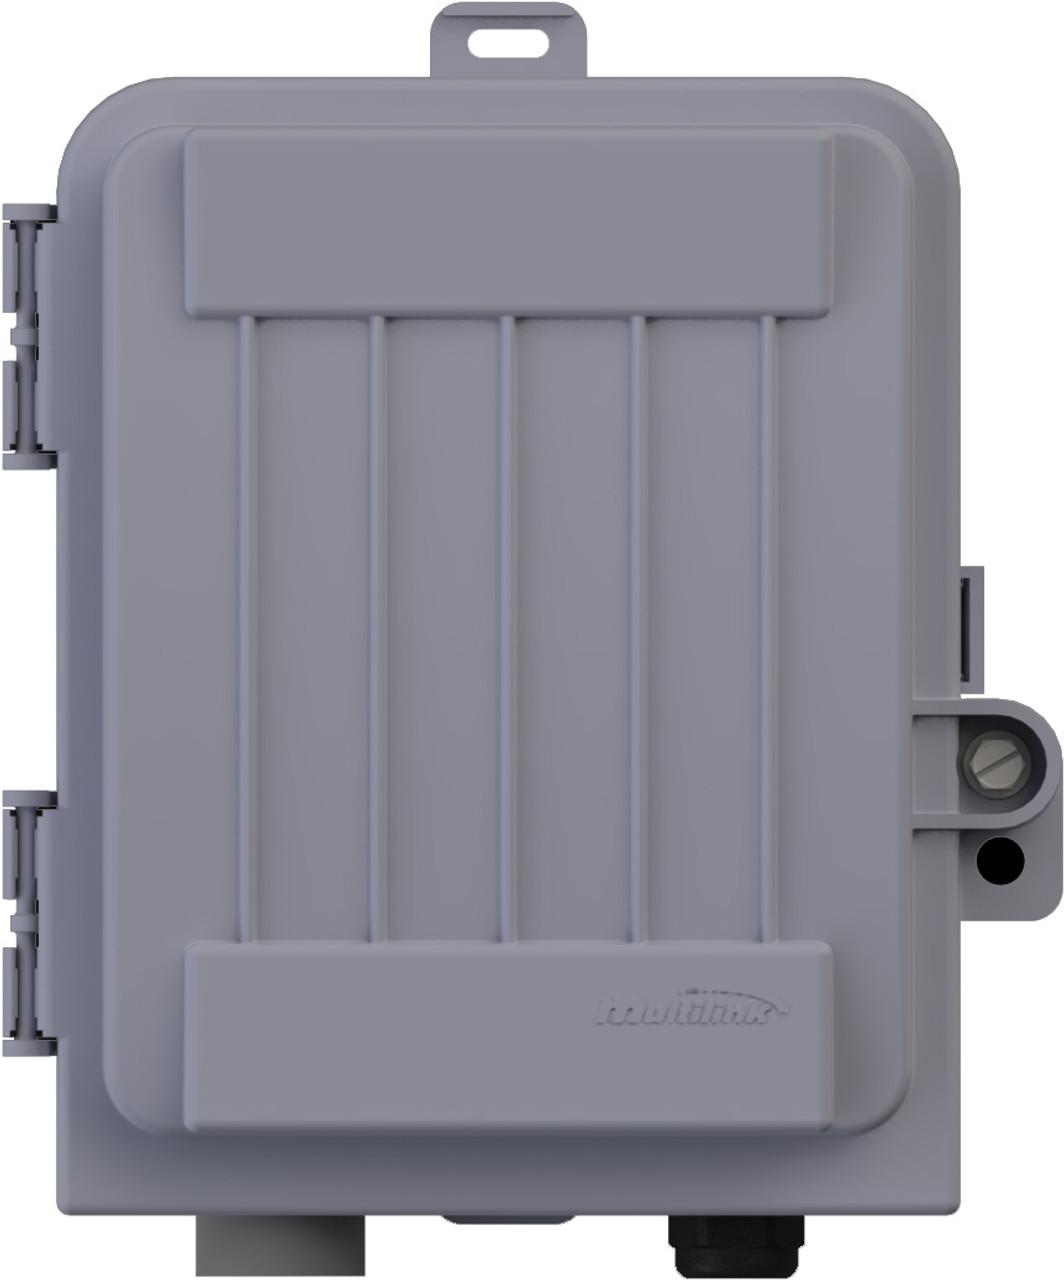 Multilink RNI-300 Demarcation Enclosure - 020-225-20